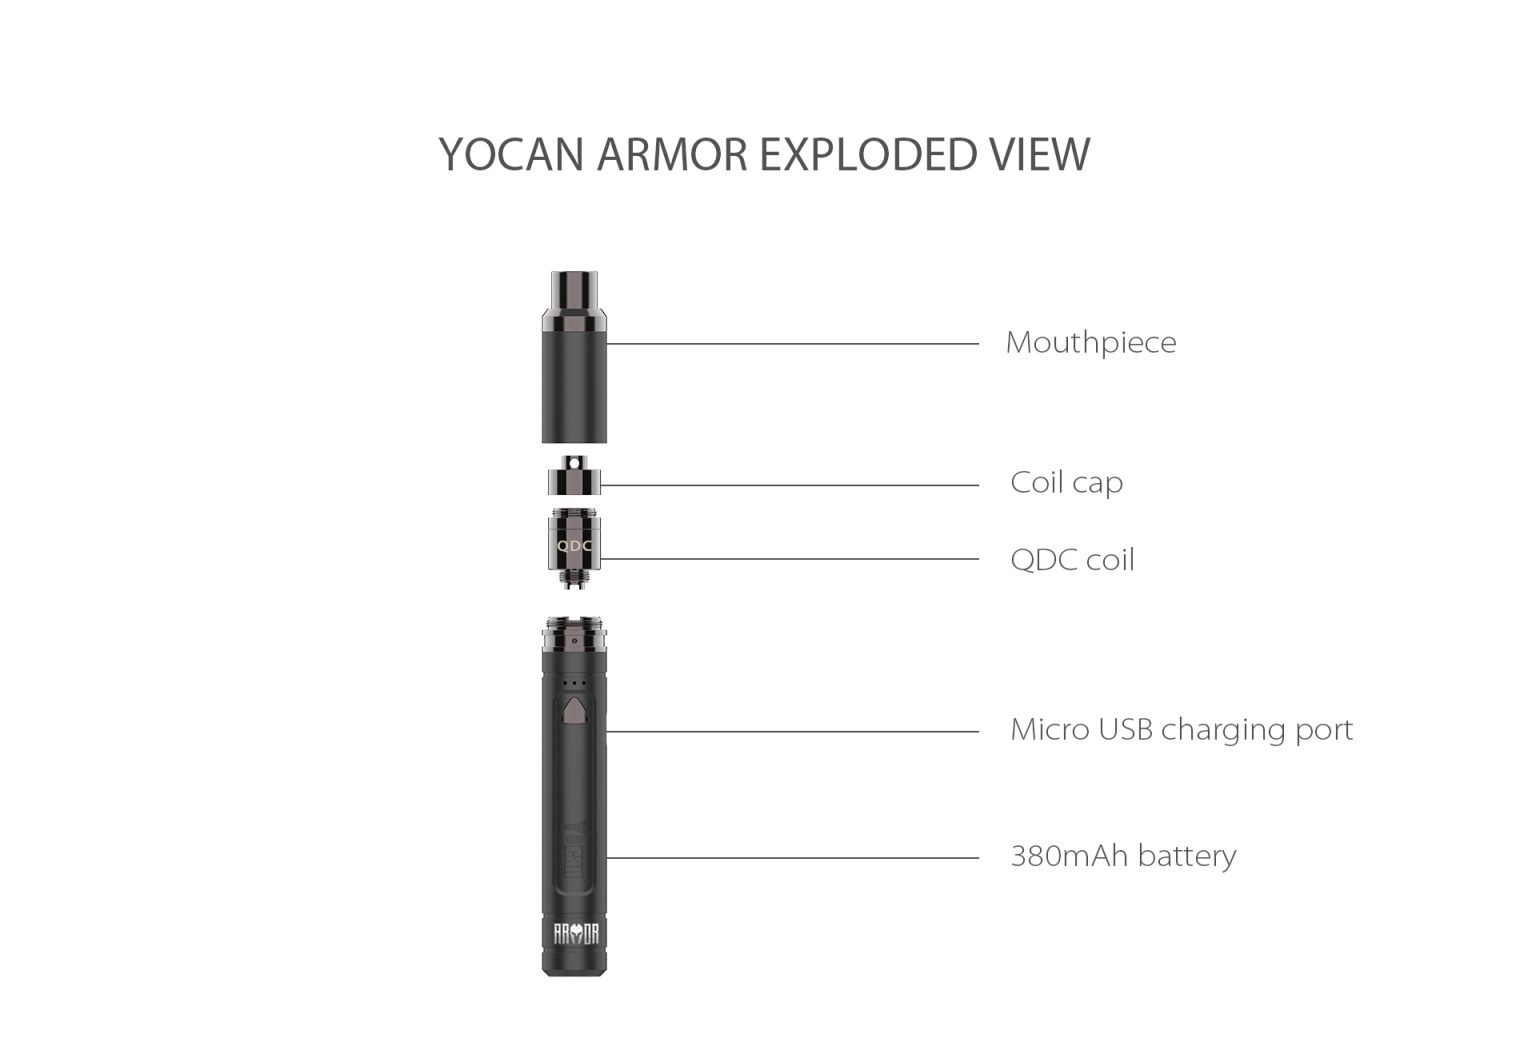 Yocan Armor